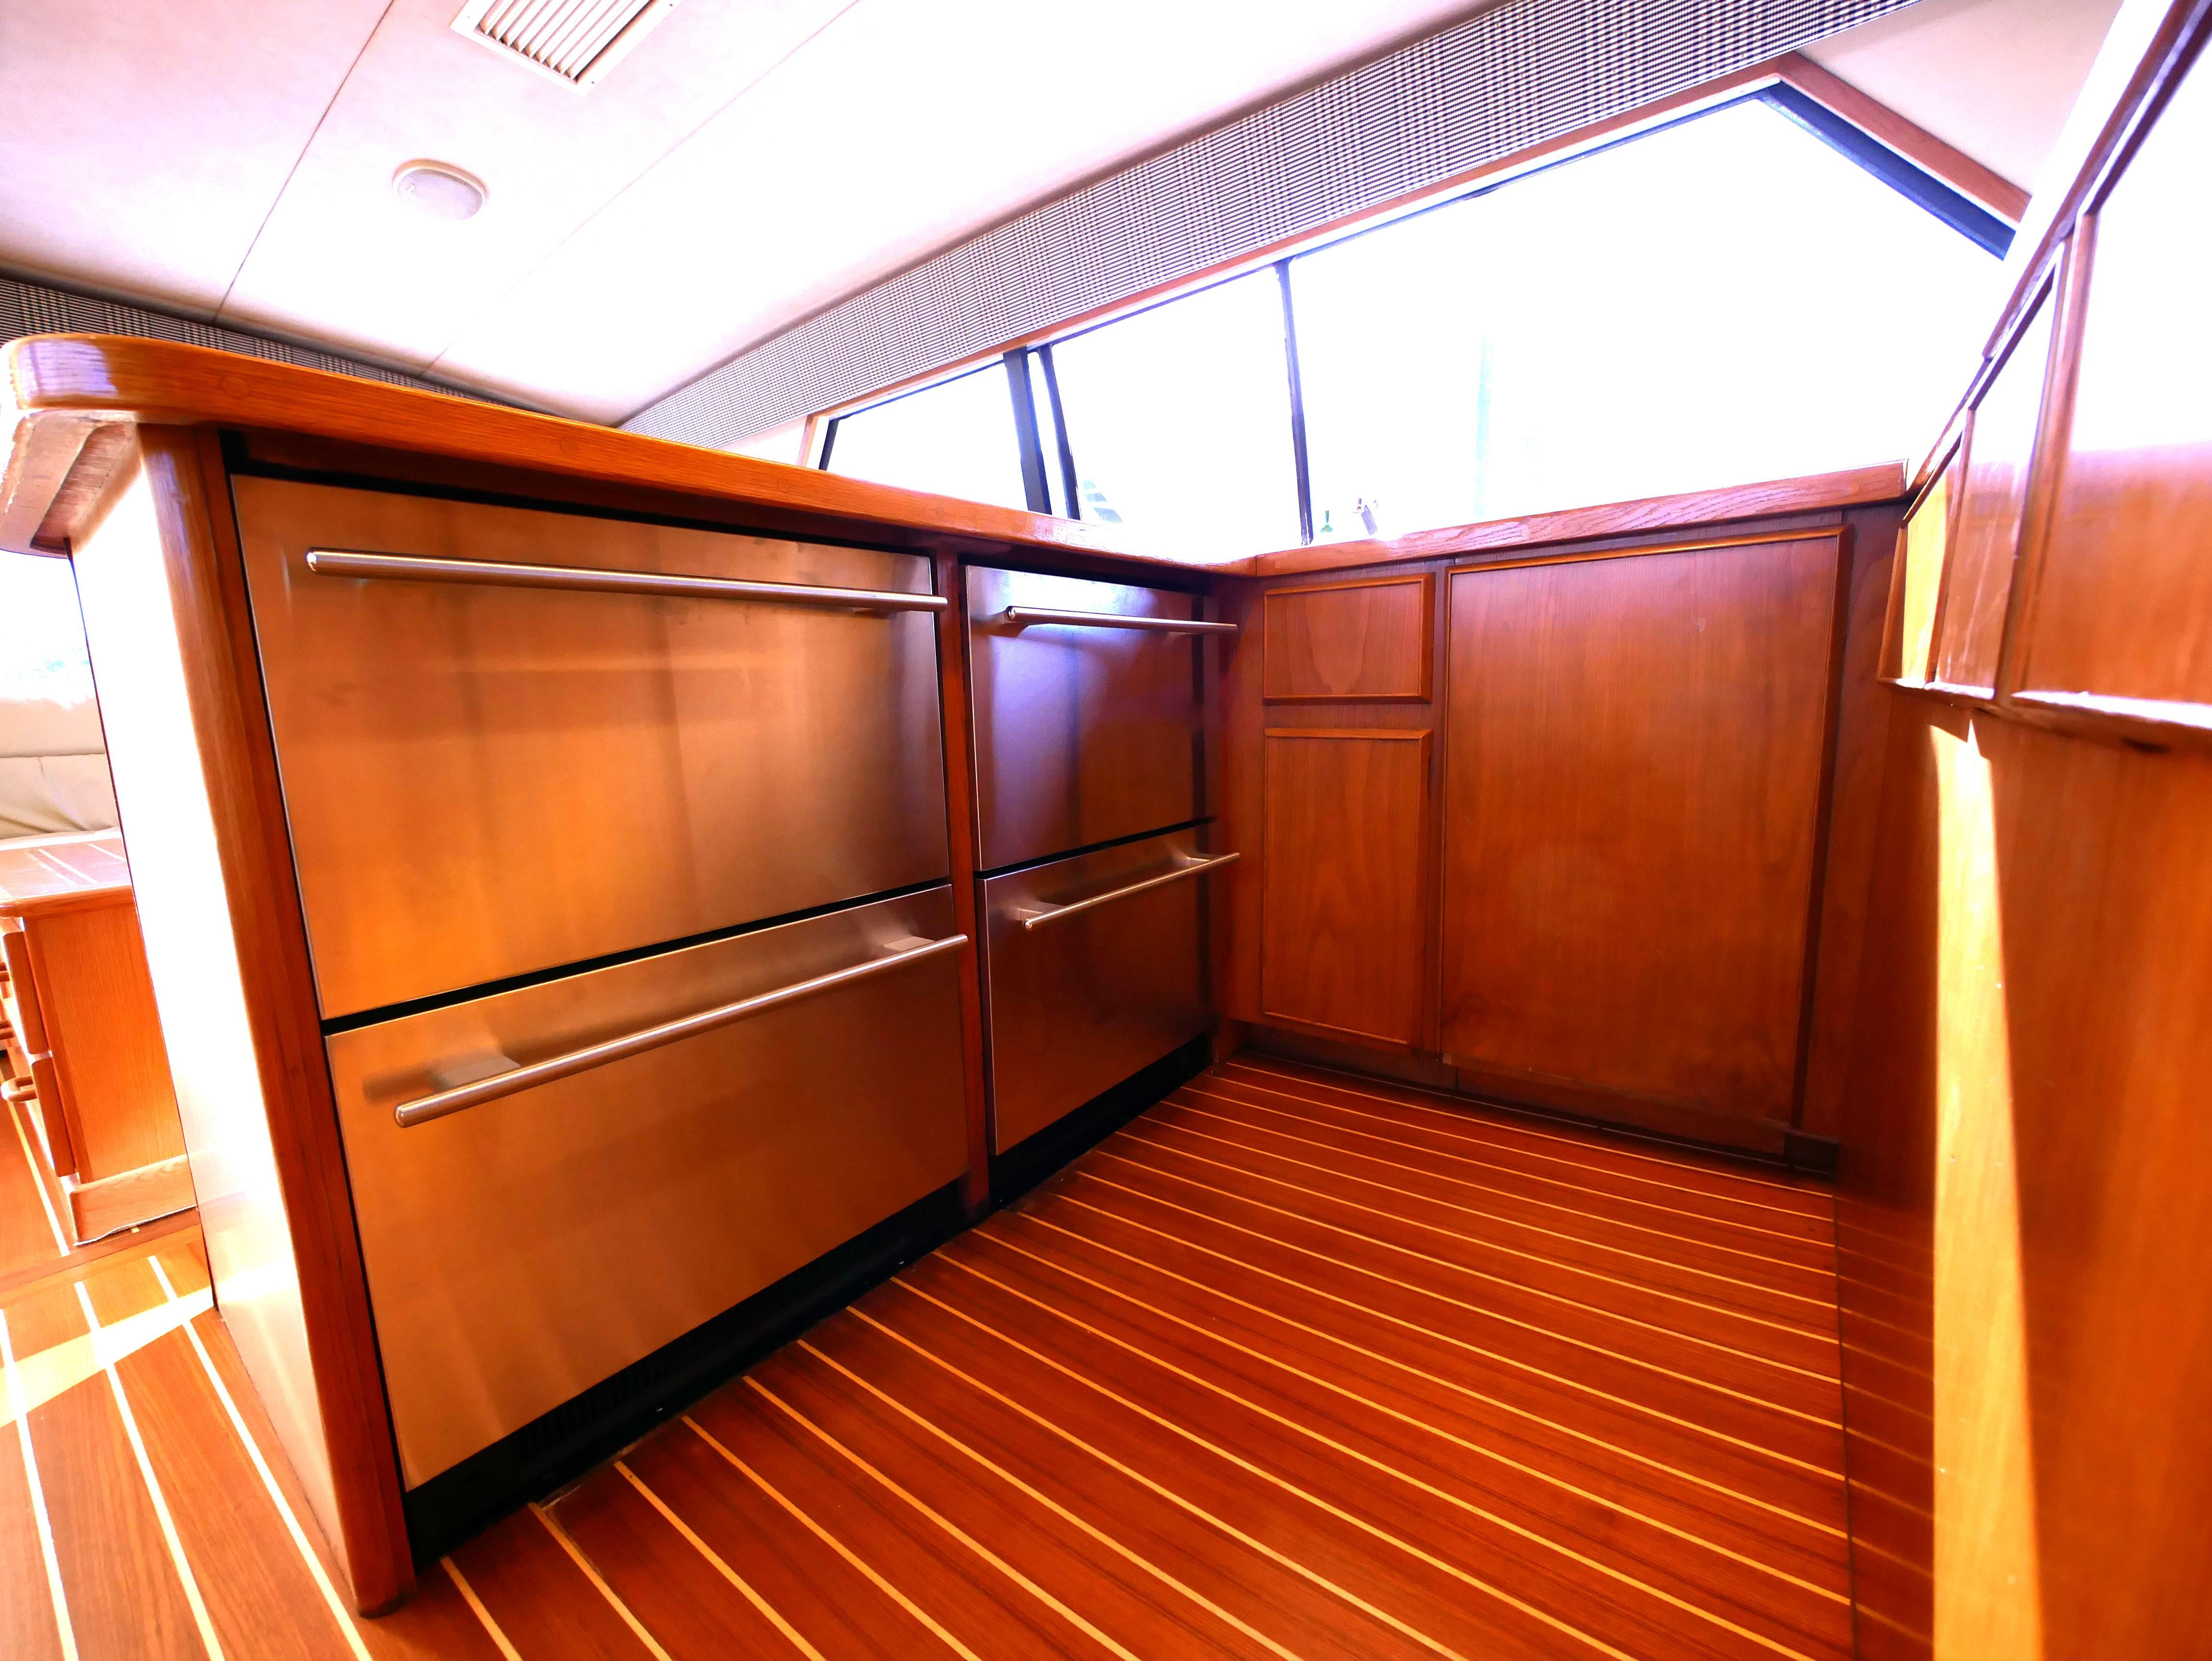 Under Counter Refrigerator and Freezer